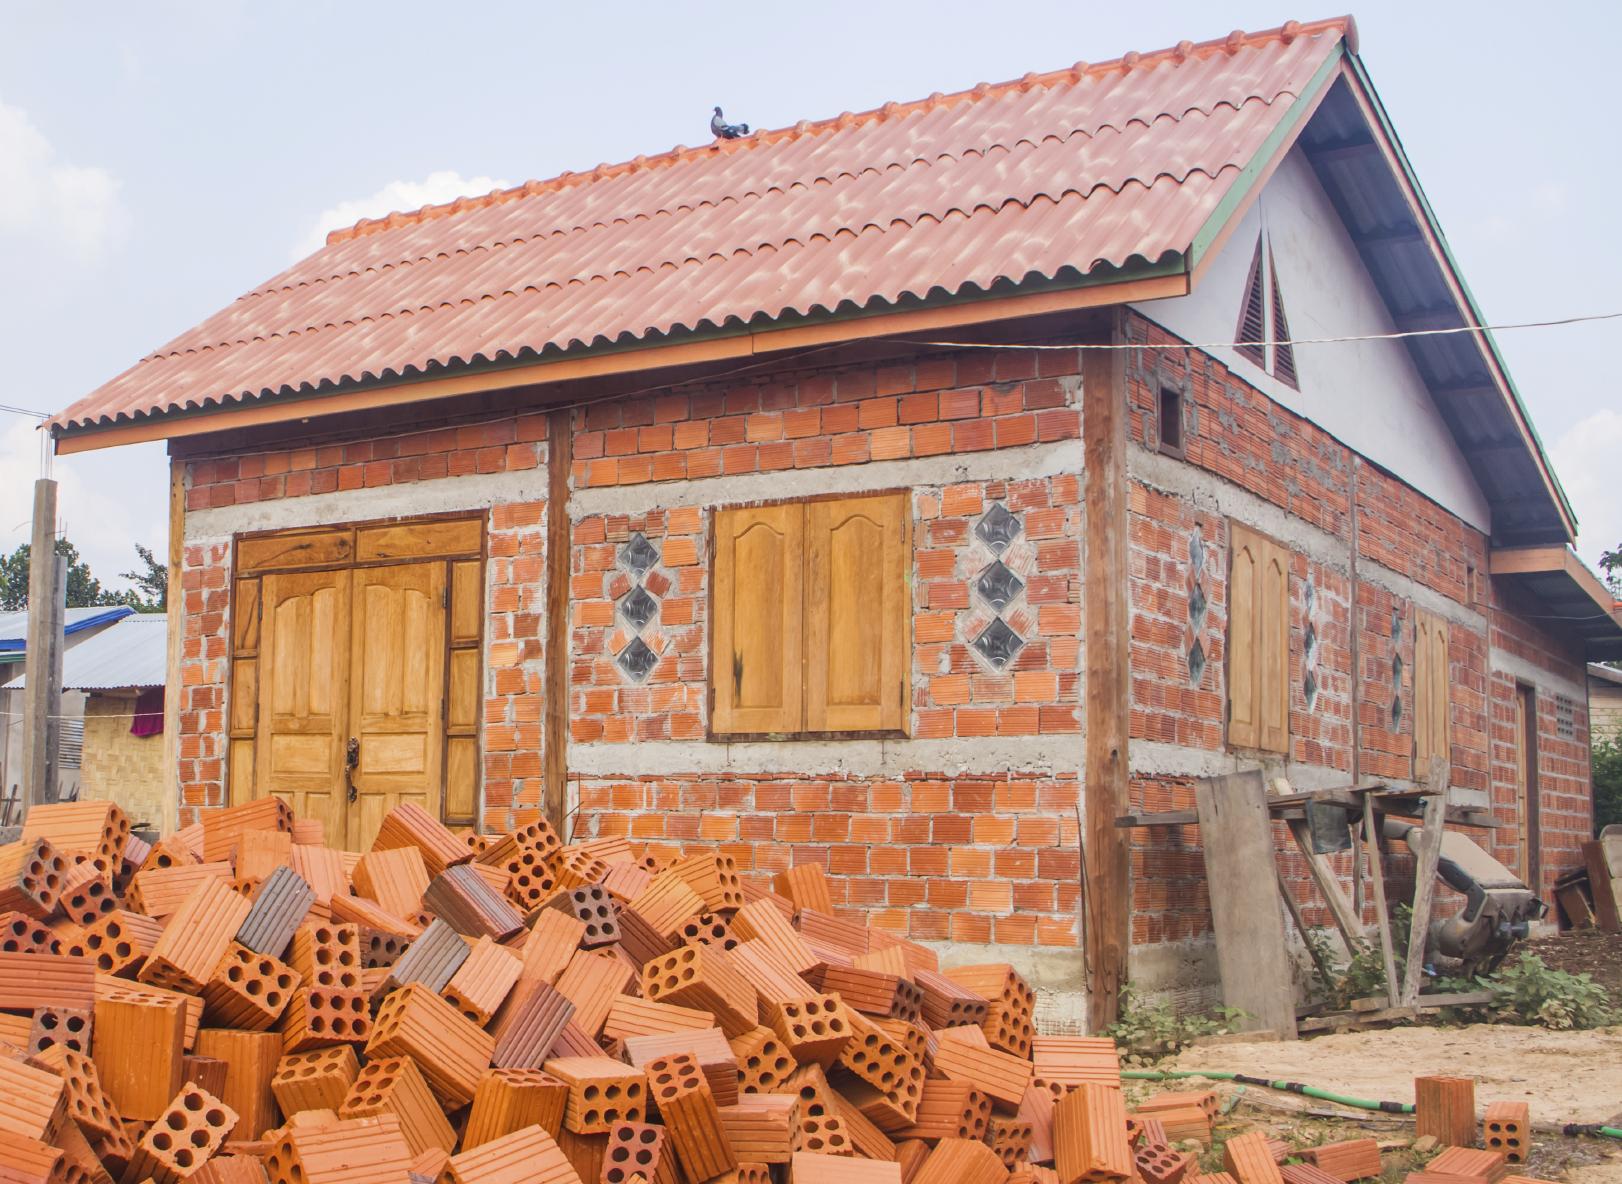 Building house with adobe bricks.